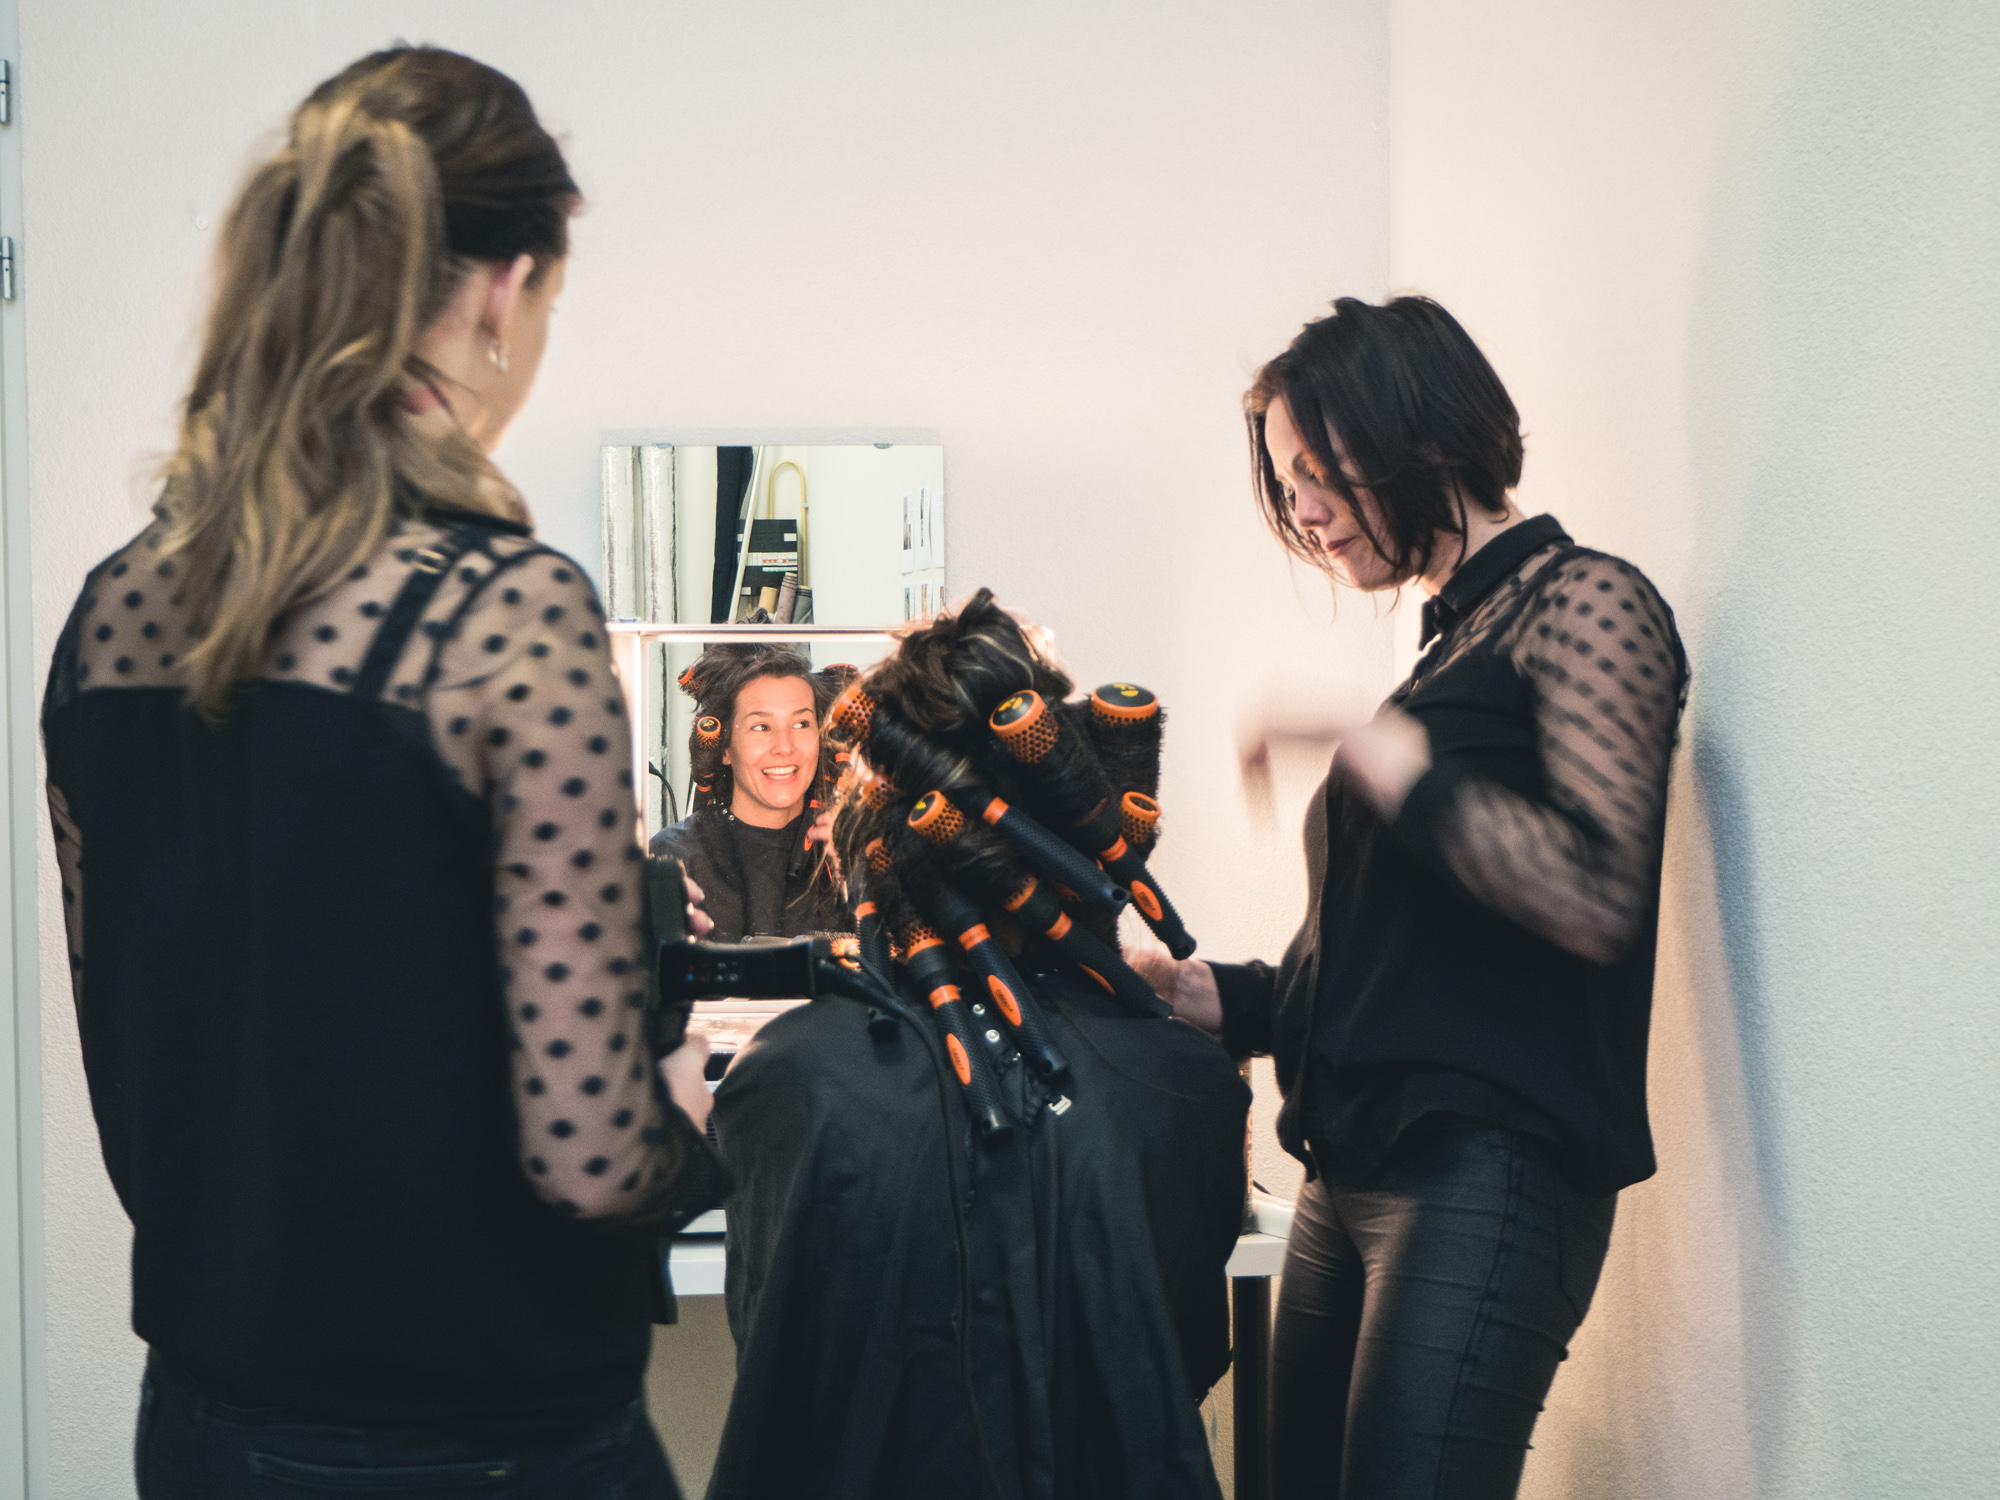 fotoshoot, backstage, behind the scenes, evely duis, fotoshoot, fotografie, fotostudio reusel, noord brabant